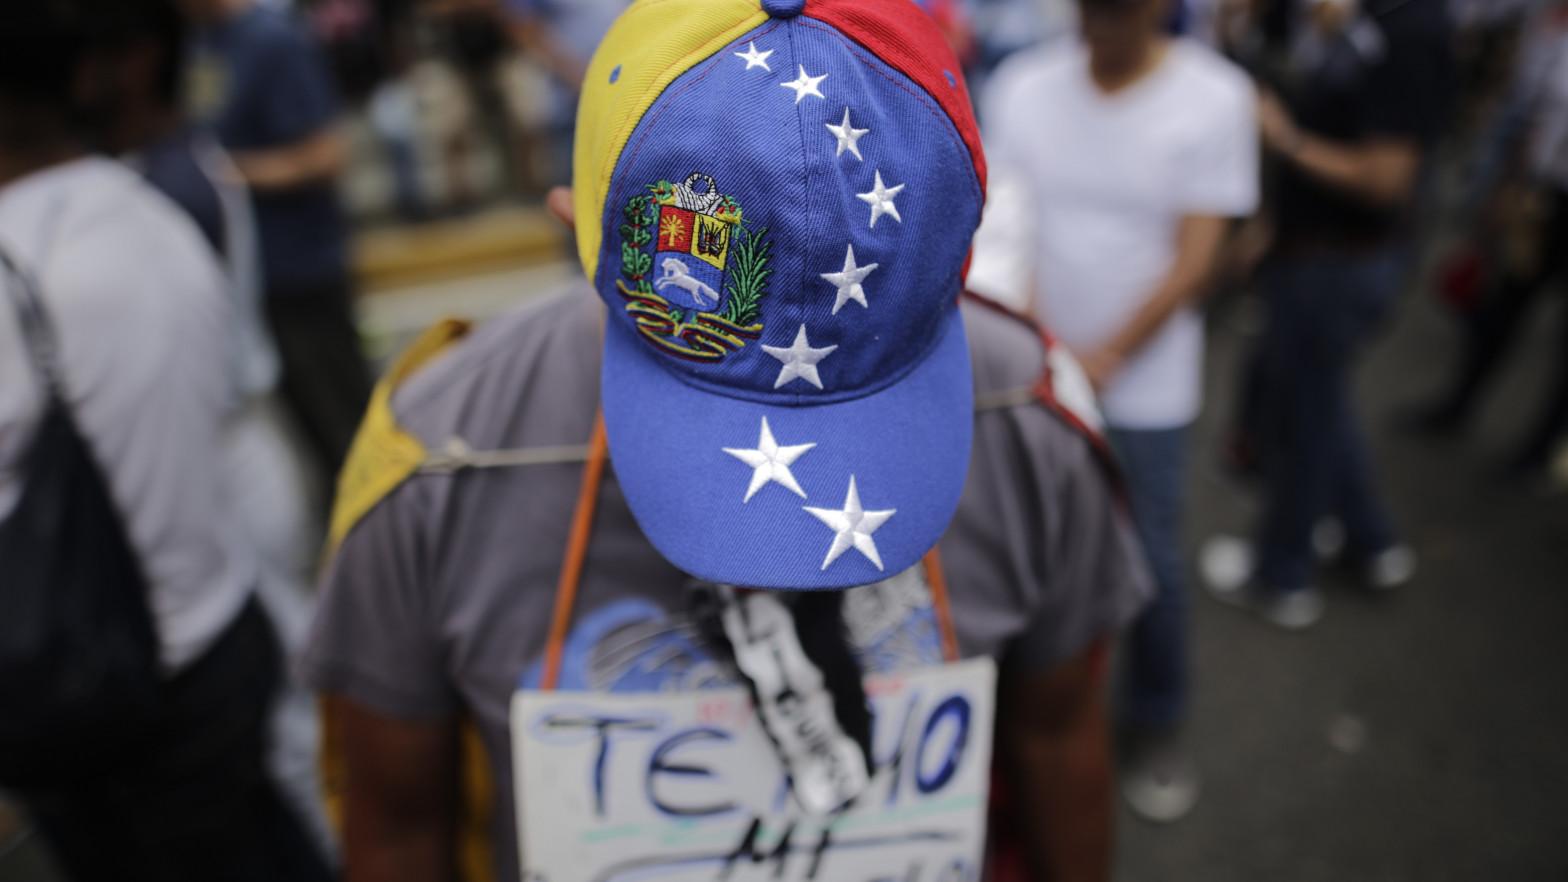 El opositor venezolano Rolando Figueroa vuelve a pedir asilo en España ante su inminente extradición por presunta estafa